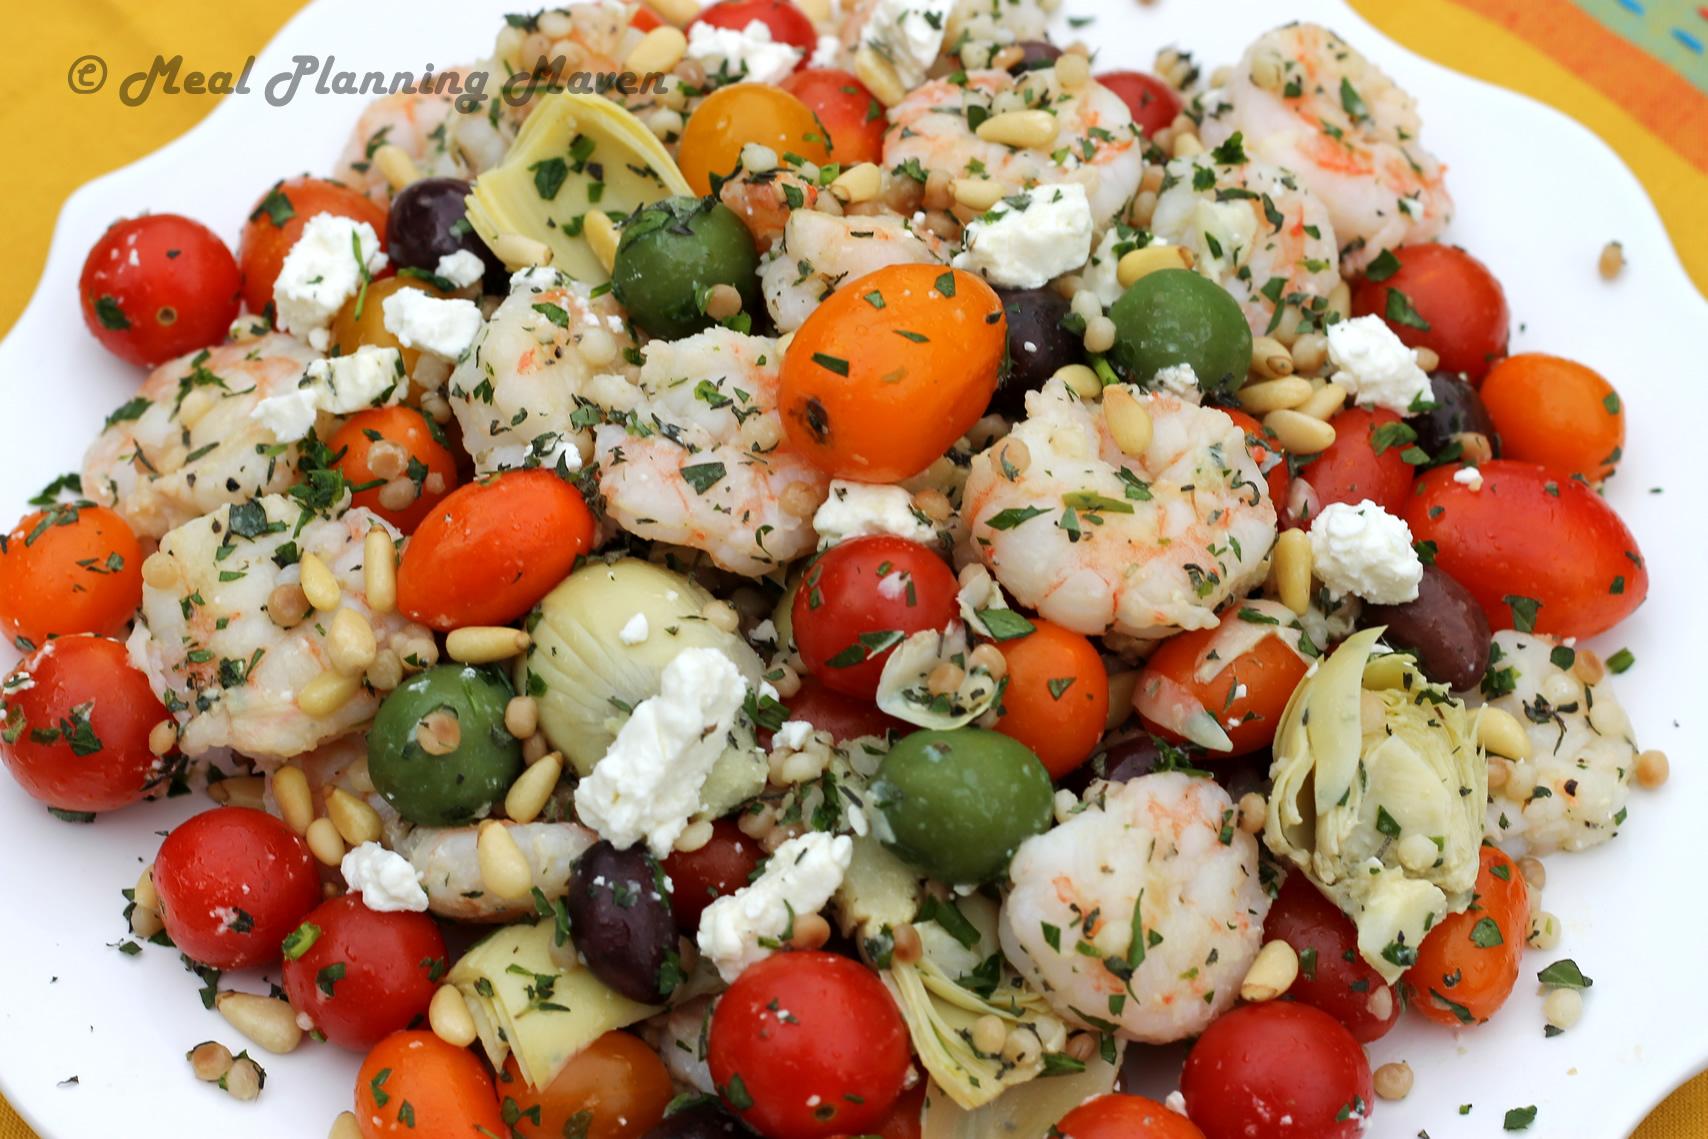 Mediterranean Shrimp 'n Couscous Salad